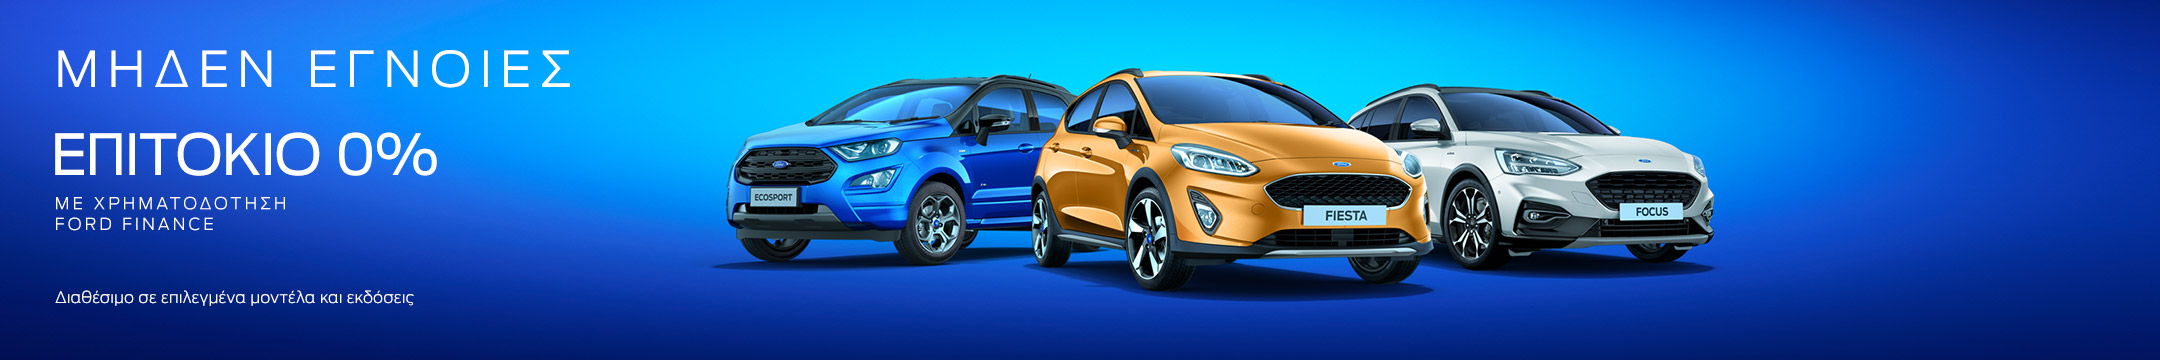 Mε 0% Επιτόκιο και 8 Χρόνια Εγγύηση το νέο Χρηματοδοτικό Πρόγραμμα της Ford